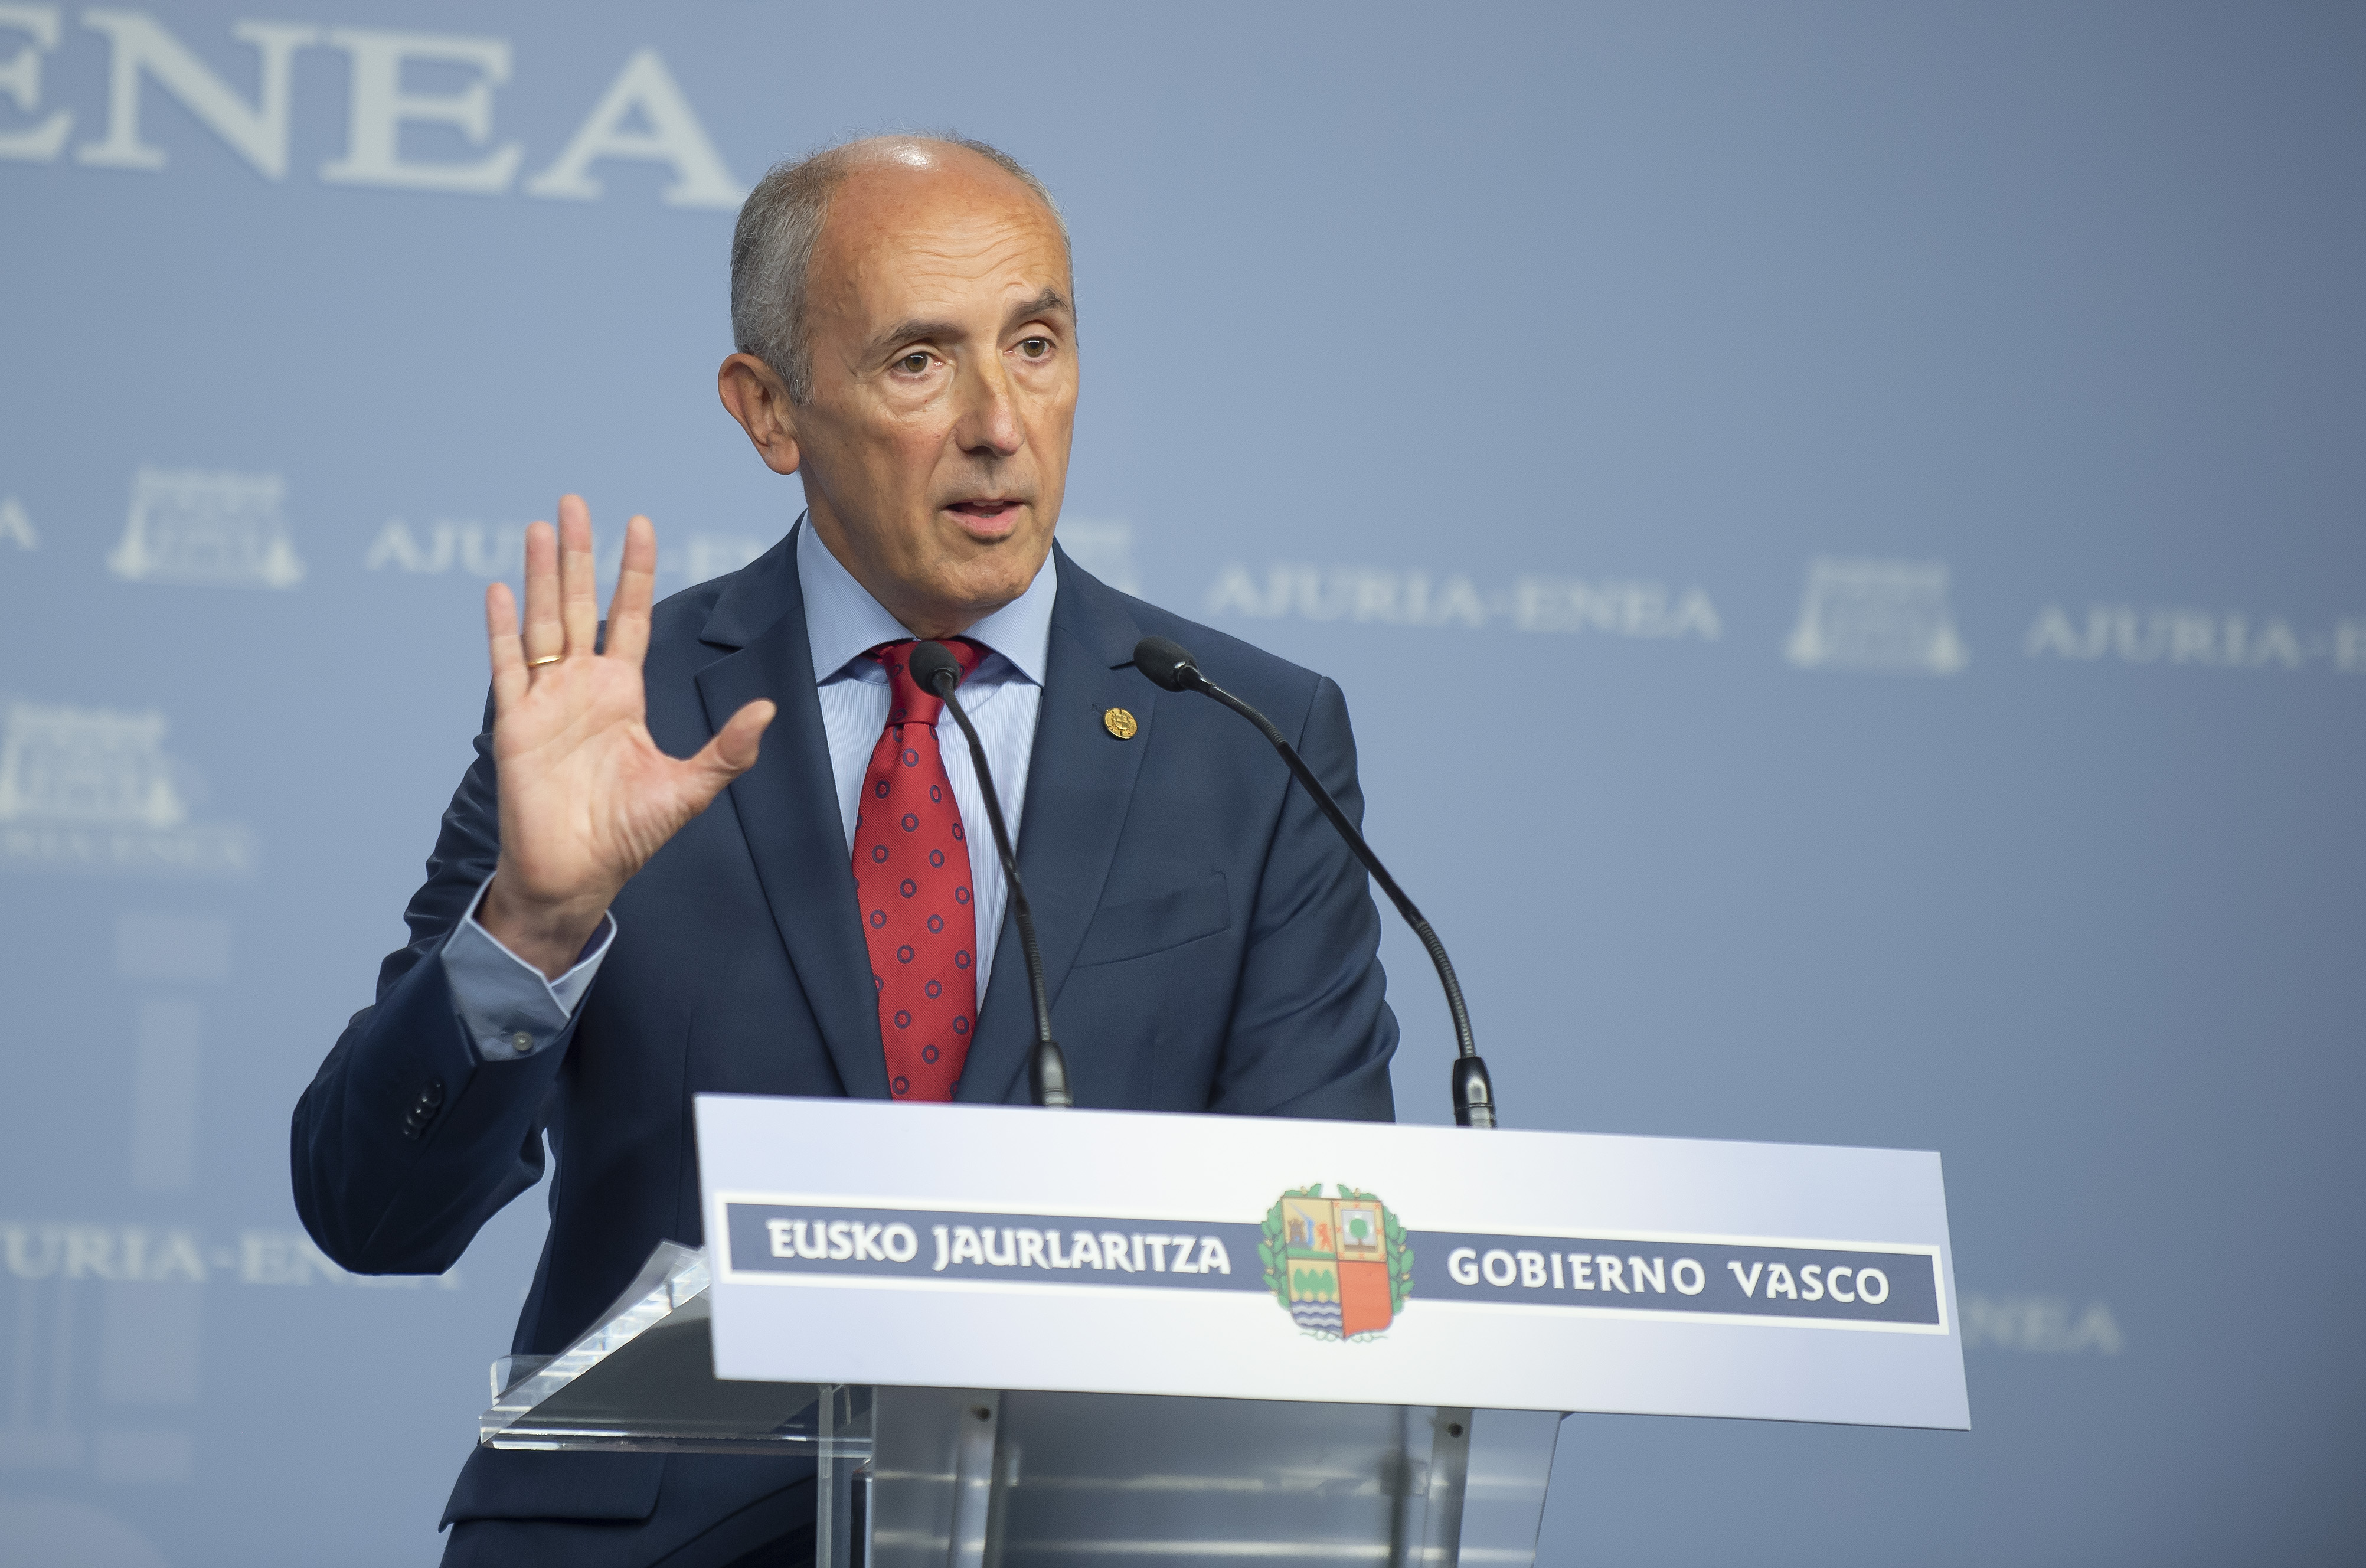 2018_09_18_consejo_gobierno_06.jpg